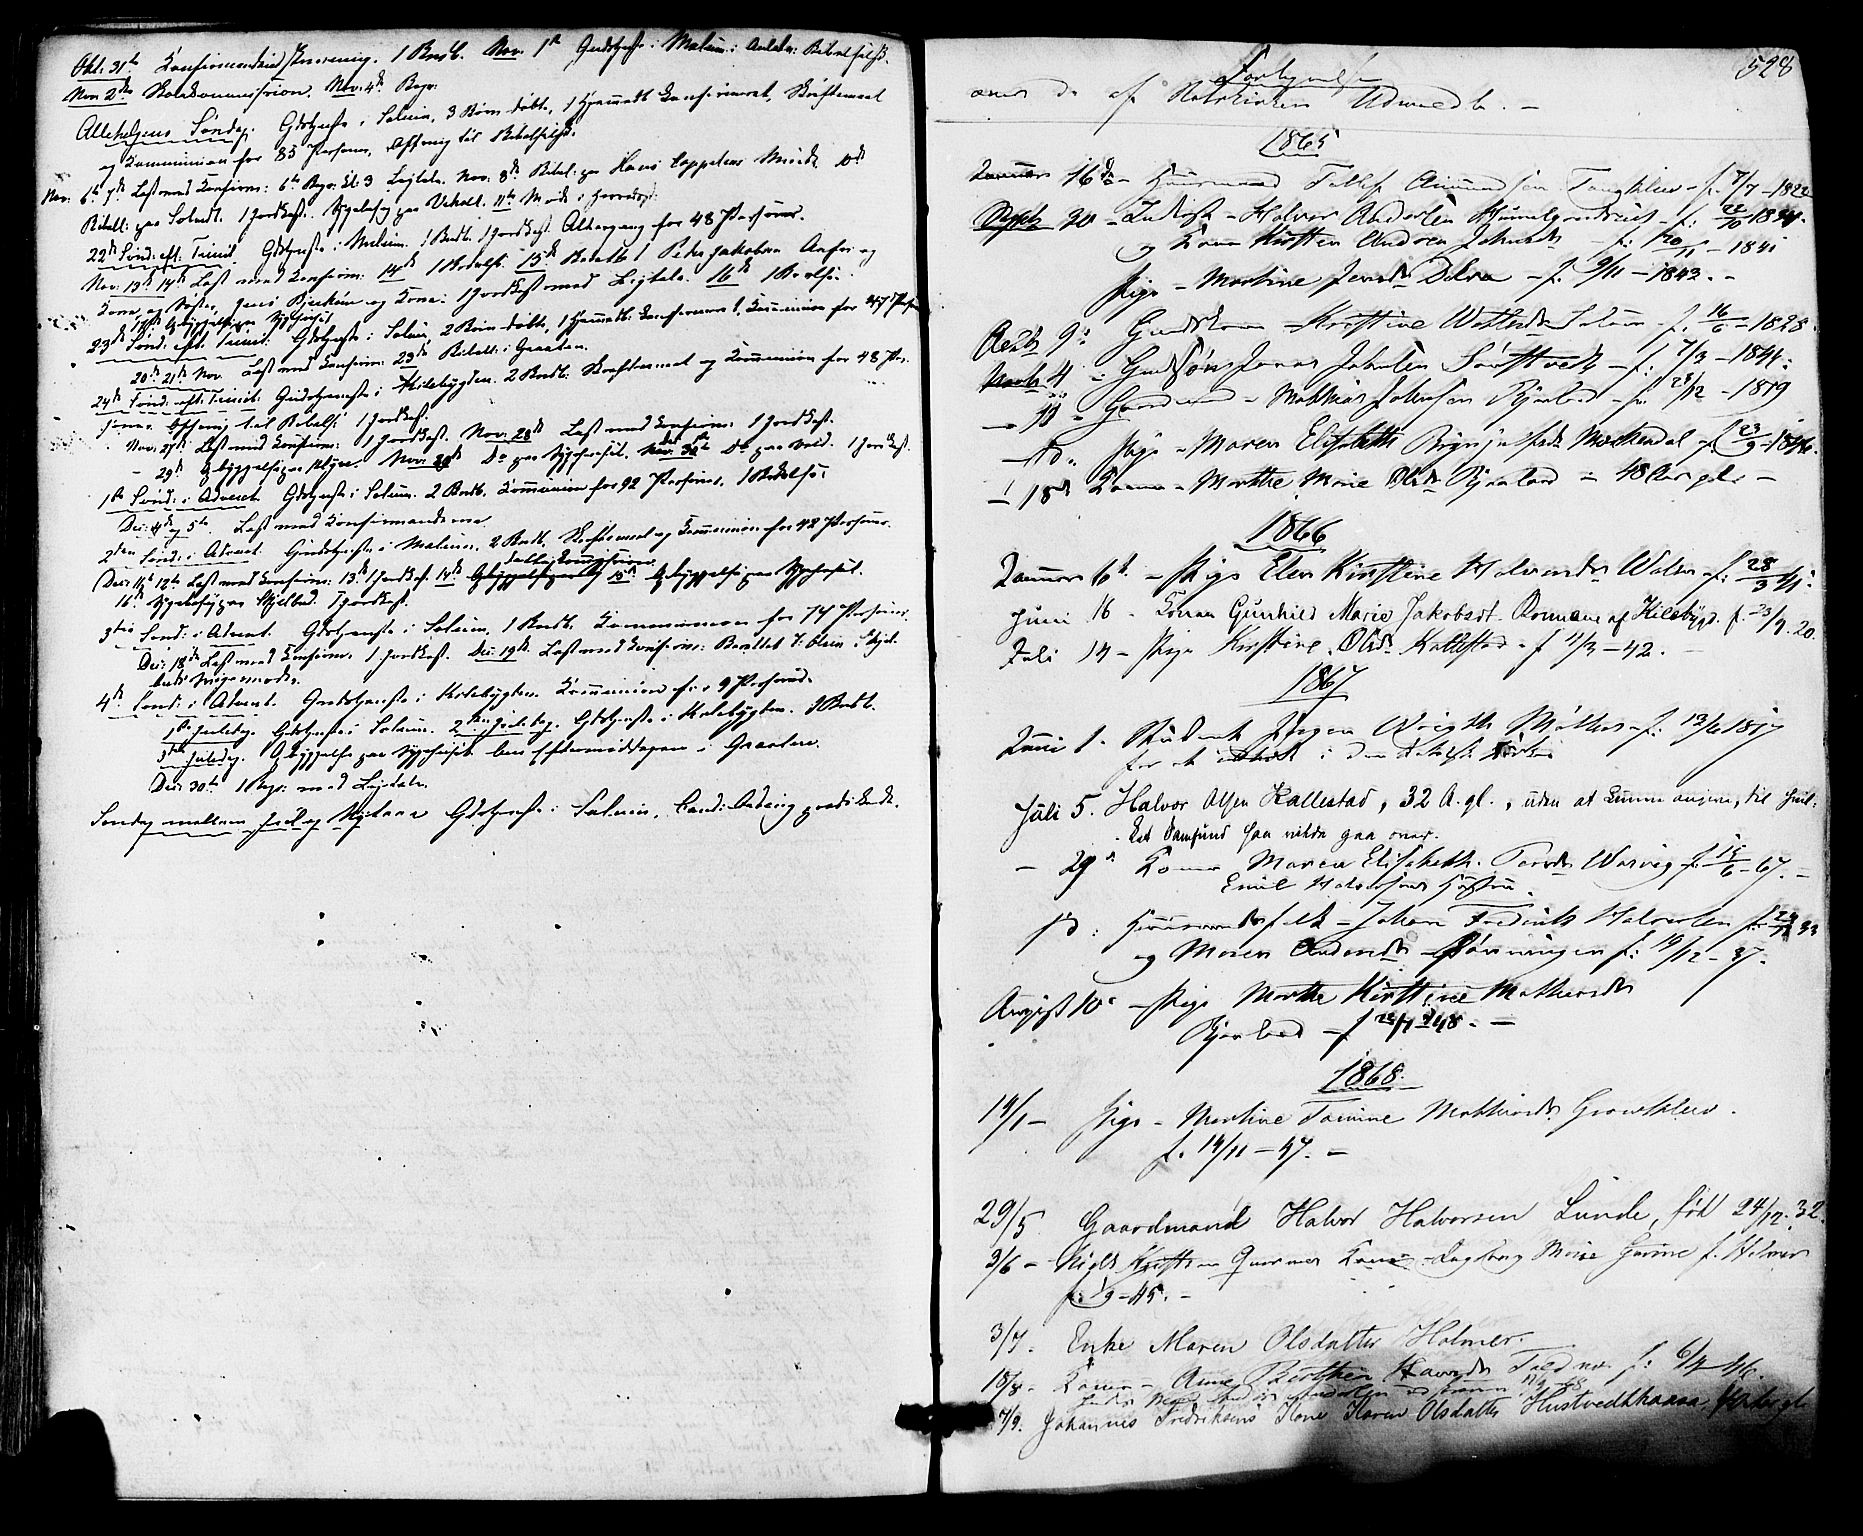 SAKO, Solum kirkebøker, F/Fa/L0008: Ministerialbok nr. I 8, 1865-1876, s. 528